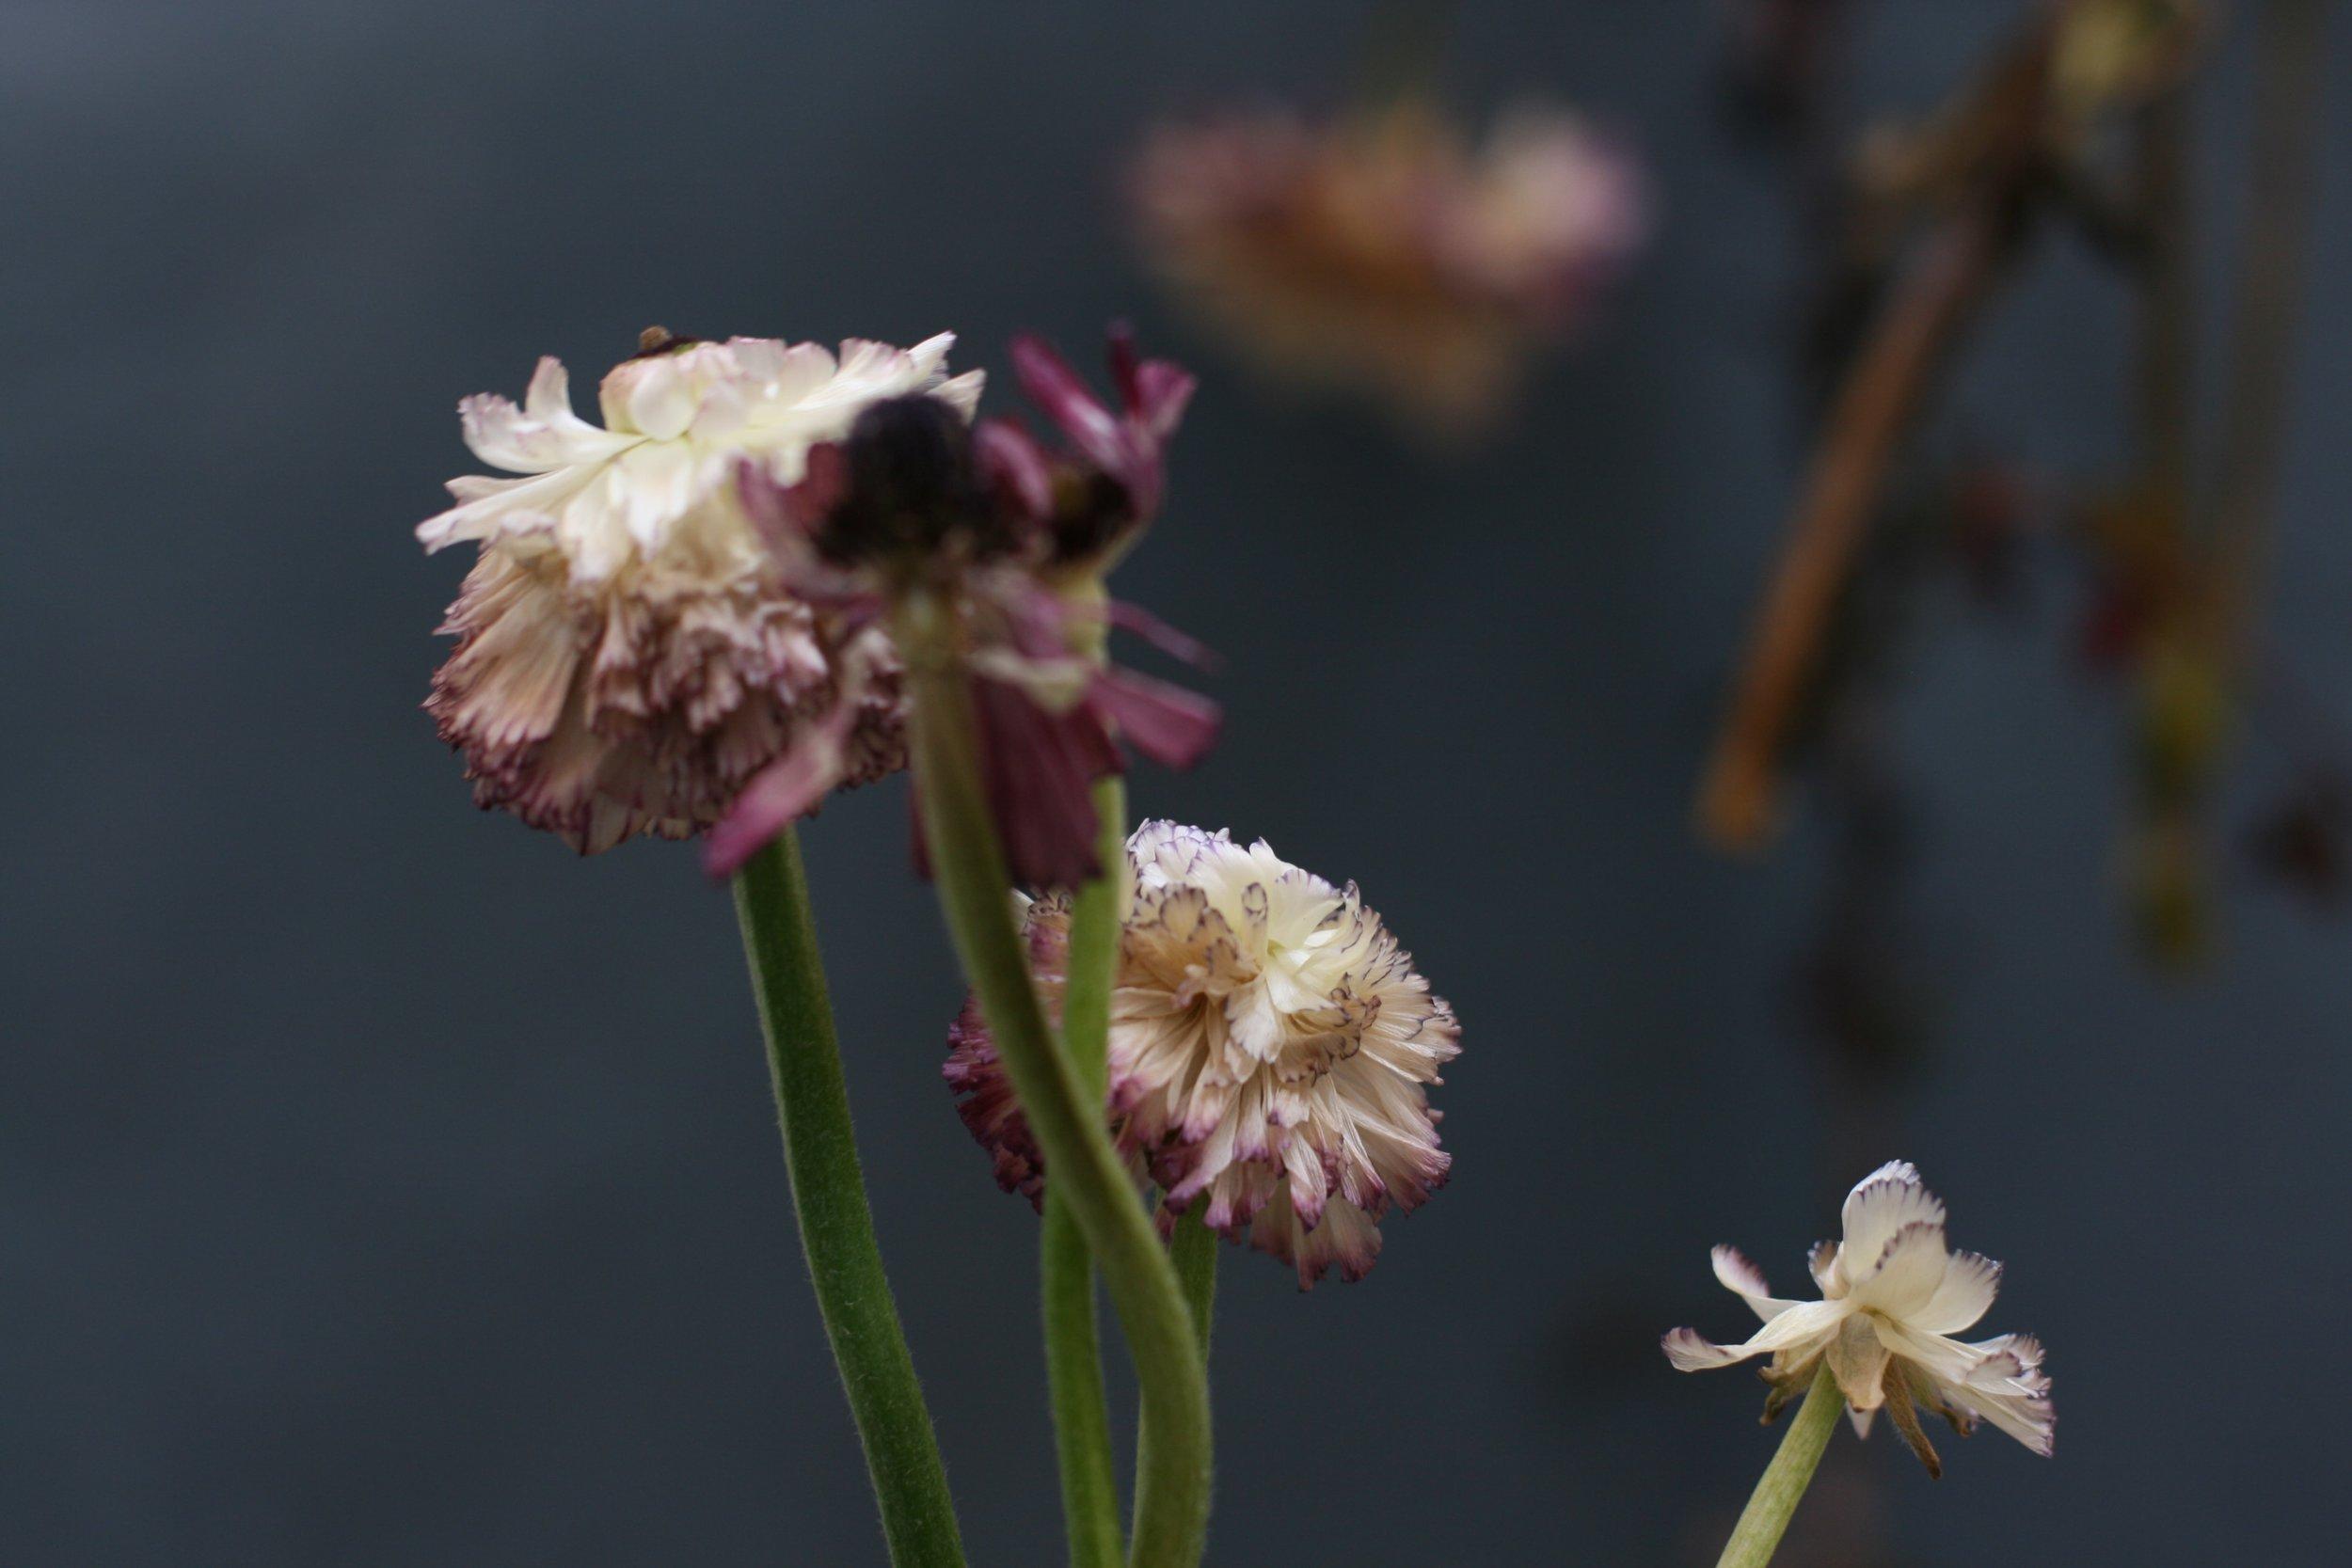 tatiana-sarasa-artist-photography-flowers-min.JPG